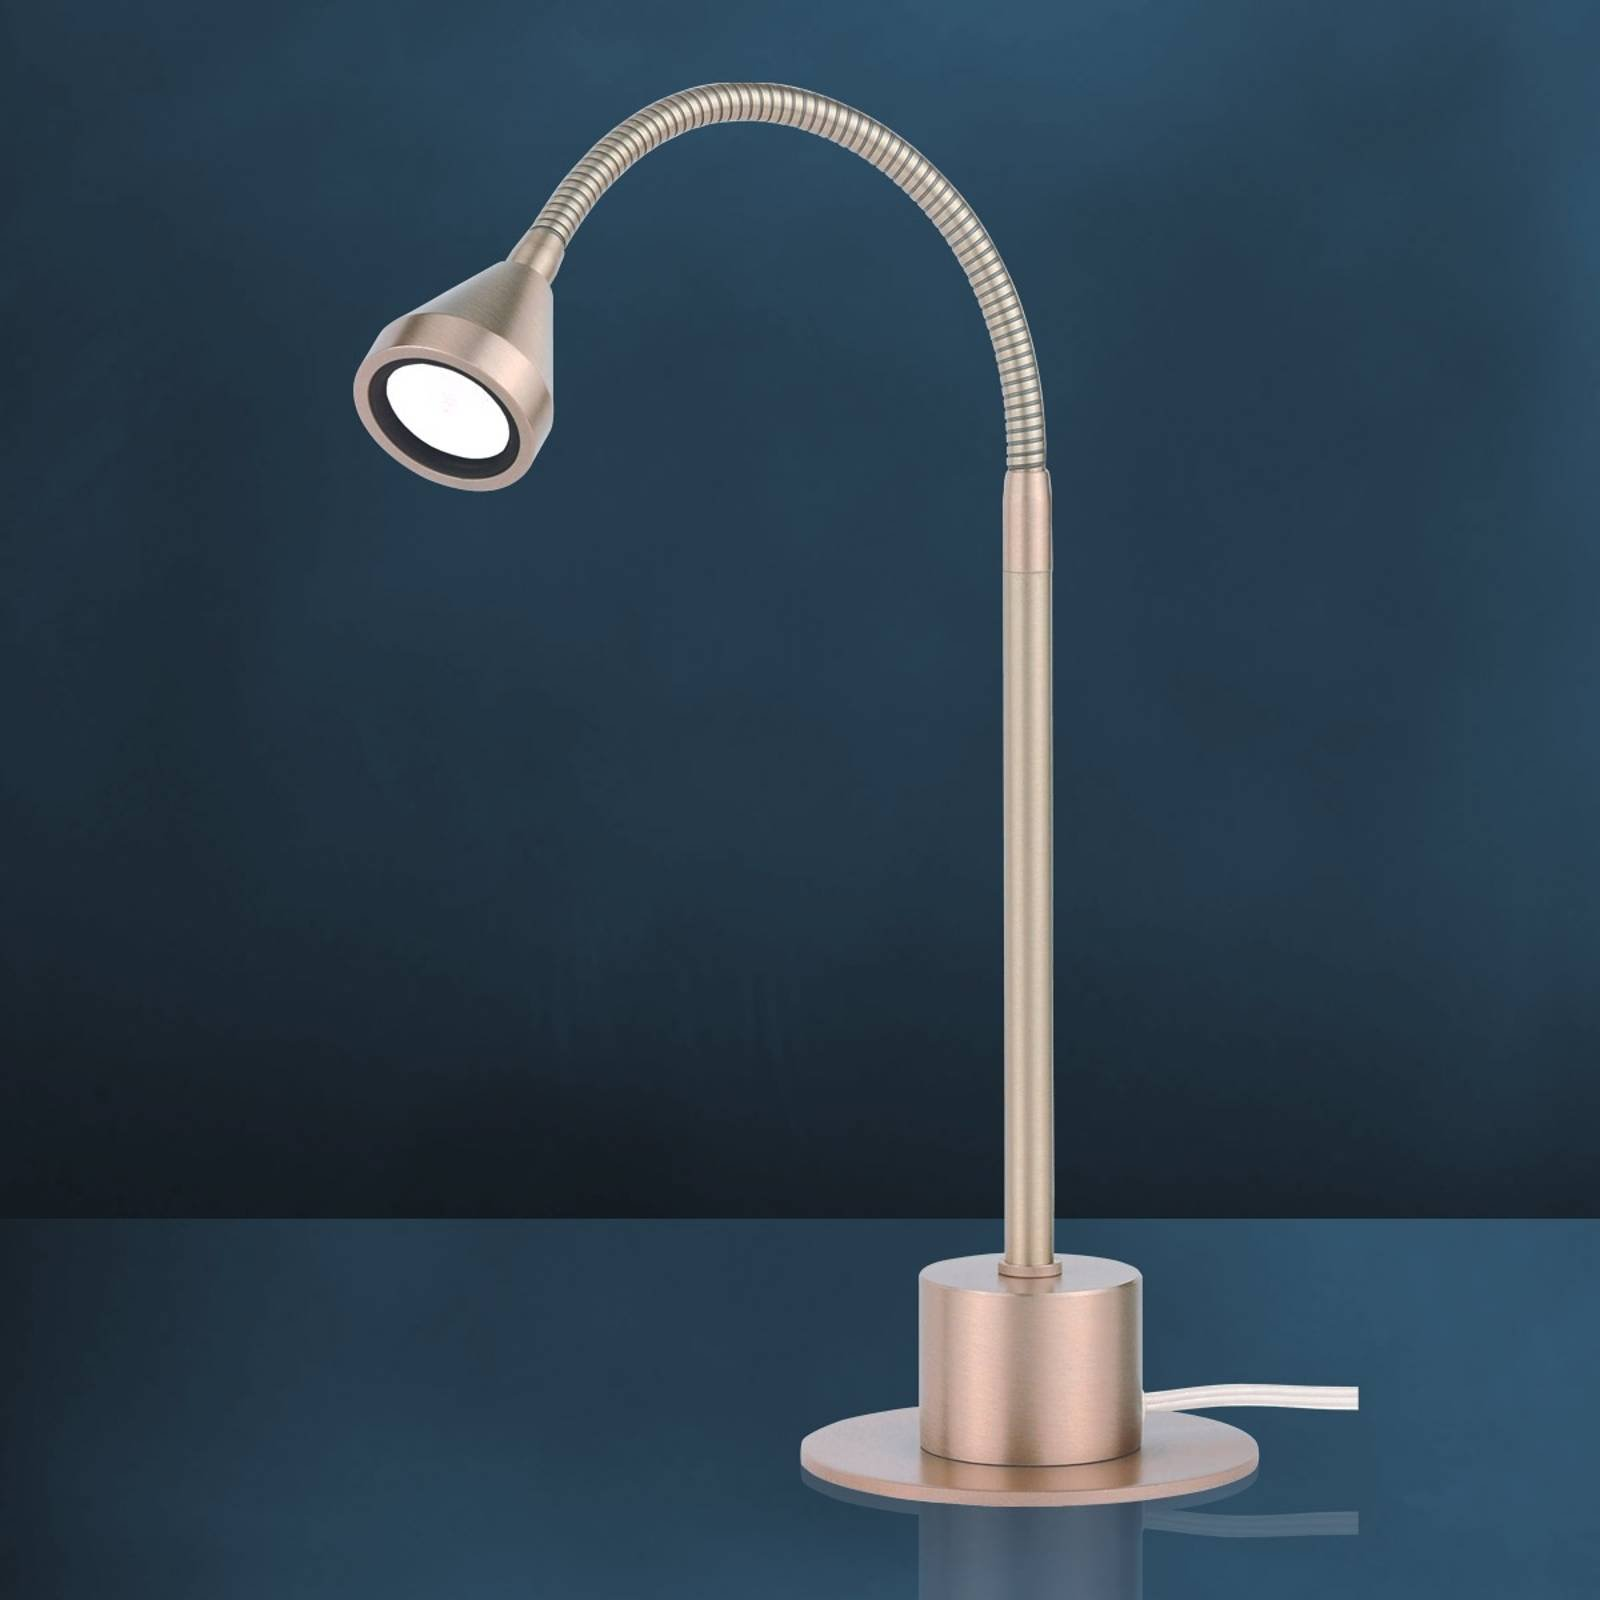 MINI LED-bordlampe m. fleks. arm og univ.hvitt lys